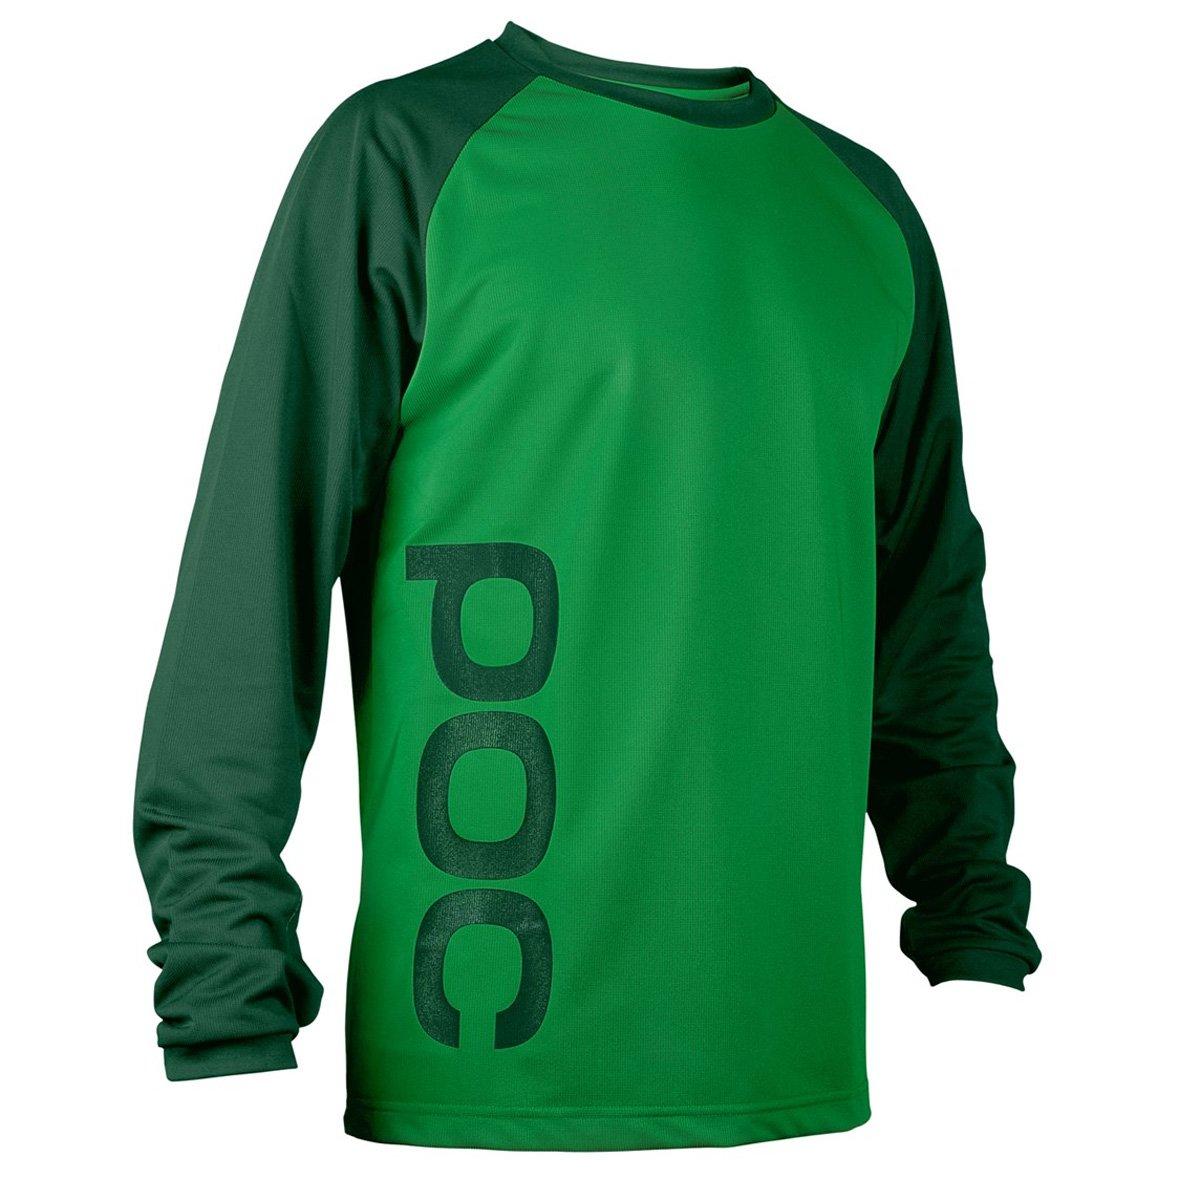 POC Flow Maillot di bicicletta da montagna Uomo Molybdenite Green/Fosfato, Unisex adulto, Verde (Molybnetine green/Phosphate green), XS Flow Jersey